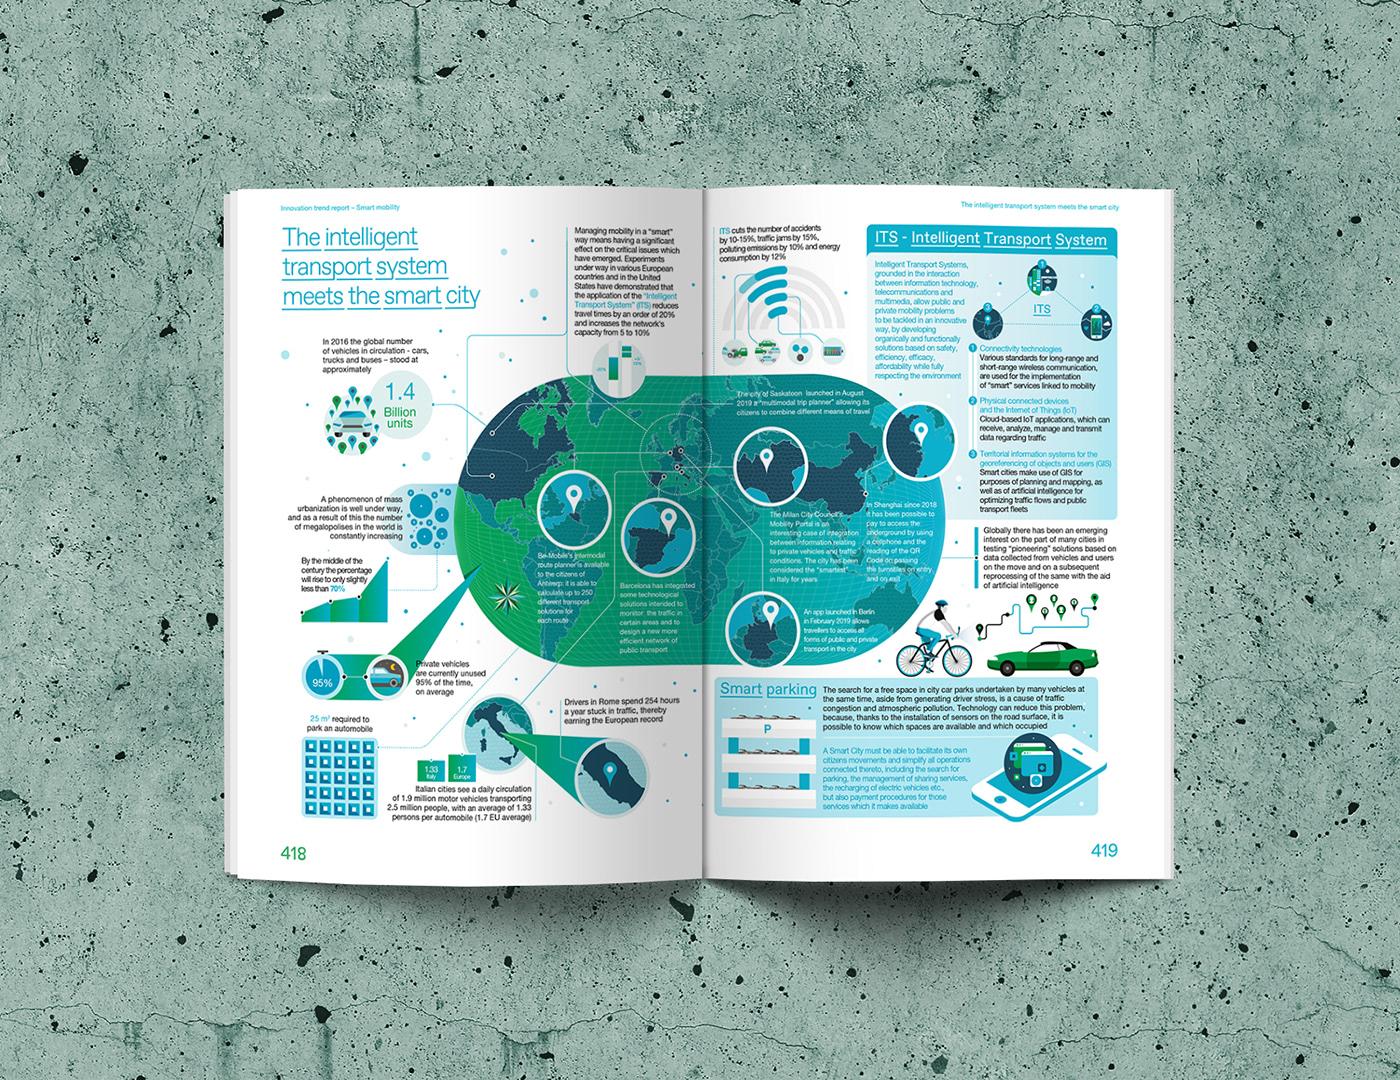 art art direction  Bank business Data data visualization design infographic report trend